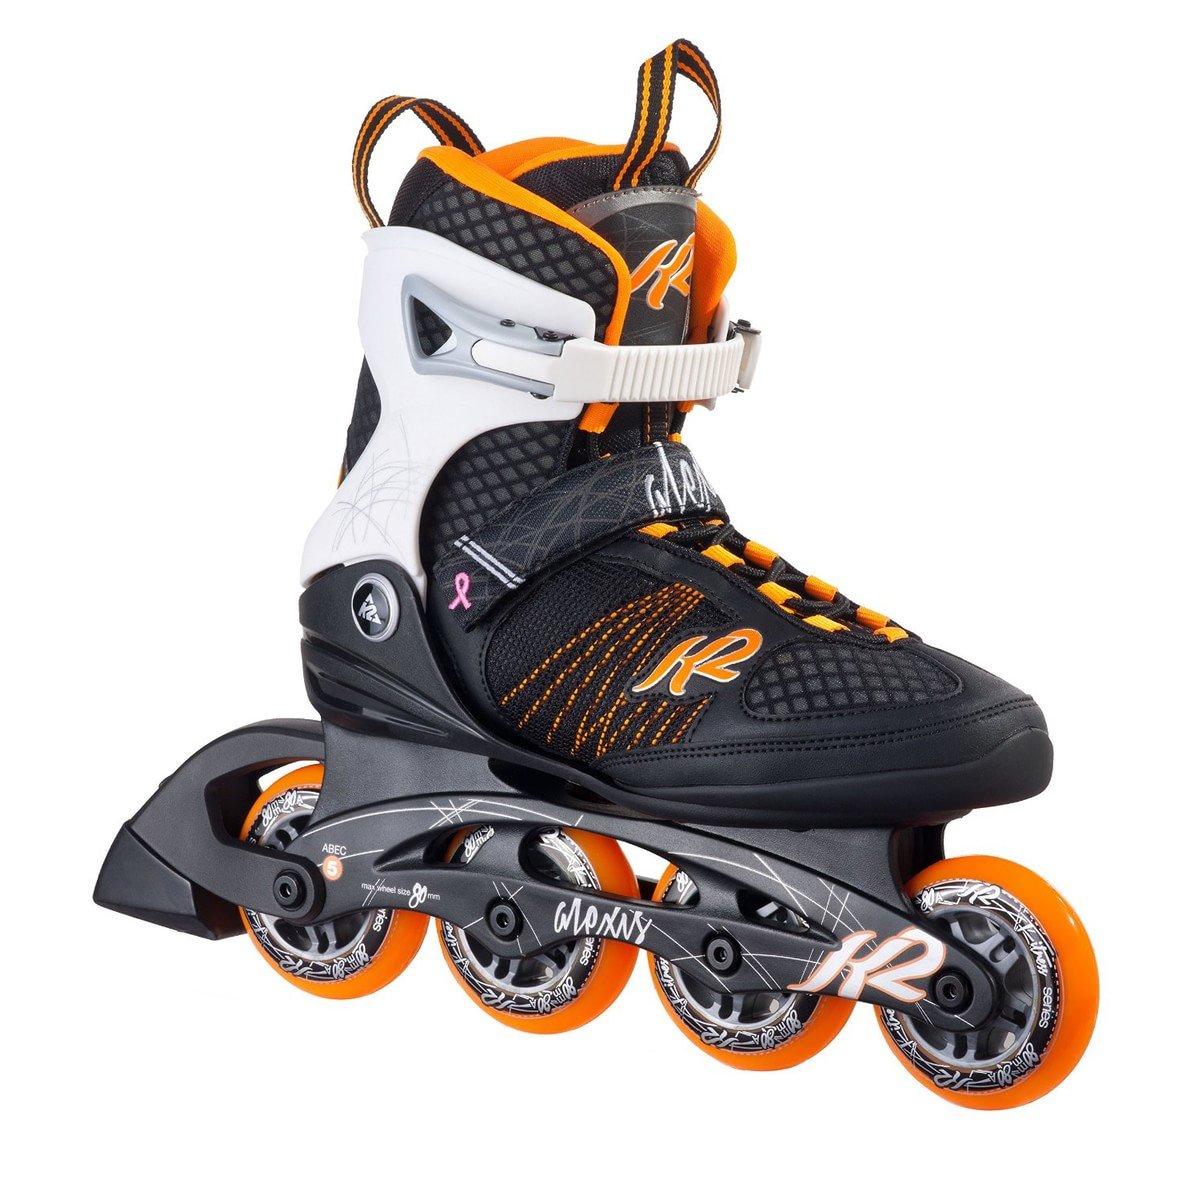 K2 Skate Women's Alexis 80 Inline Skates, Black/Tangerine, 9